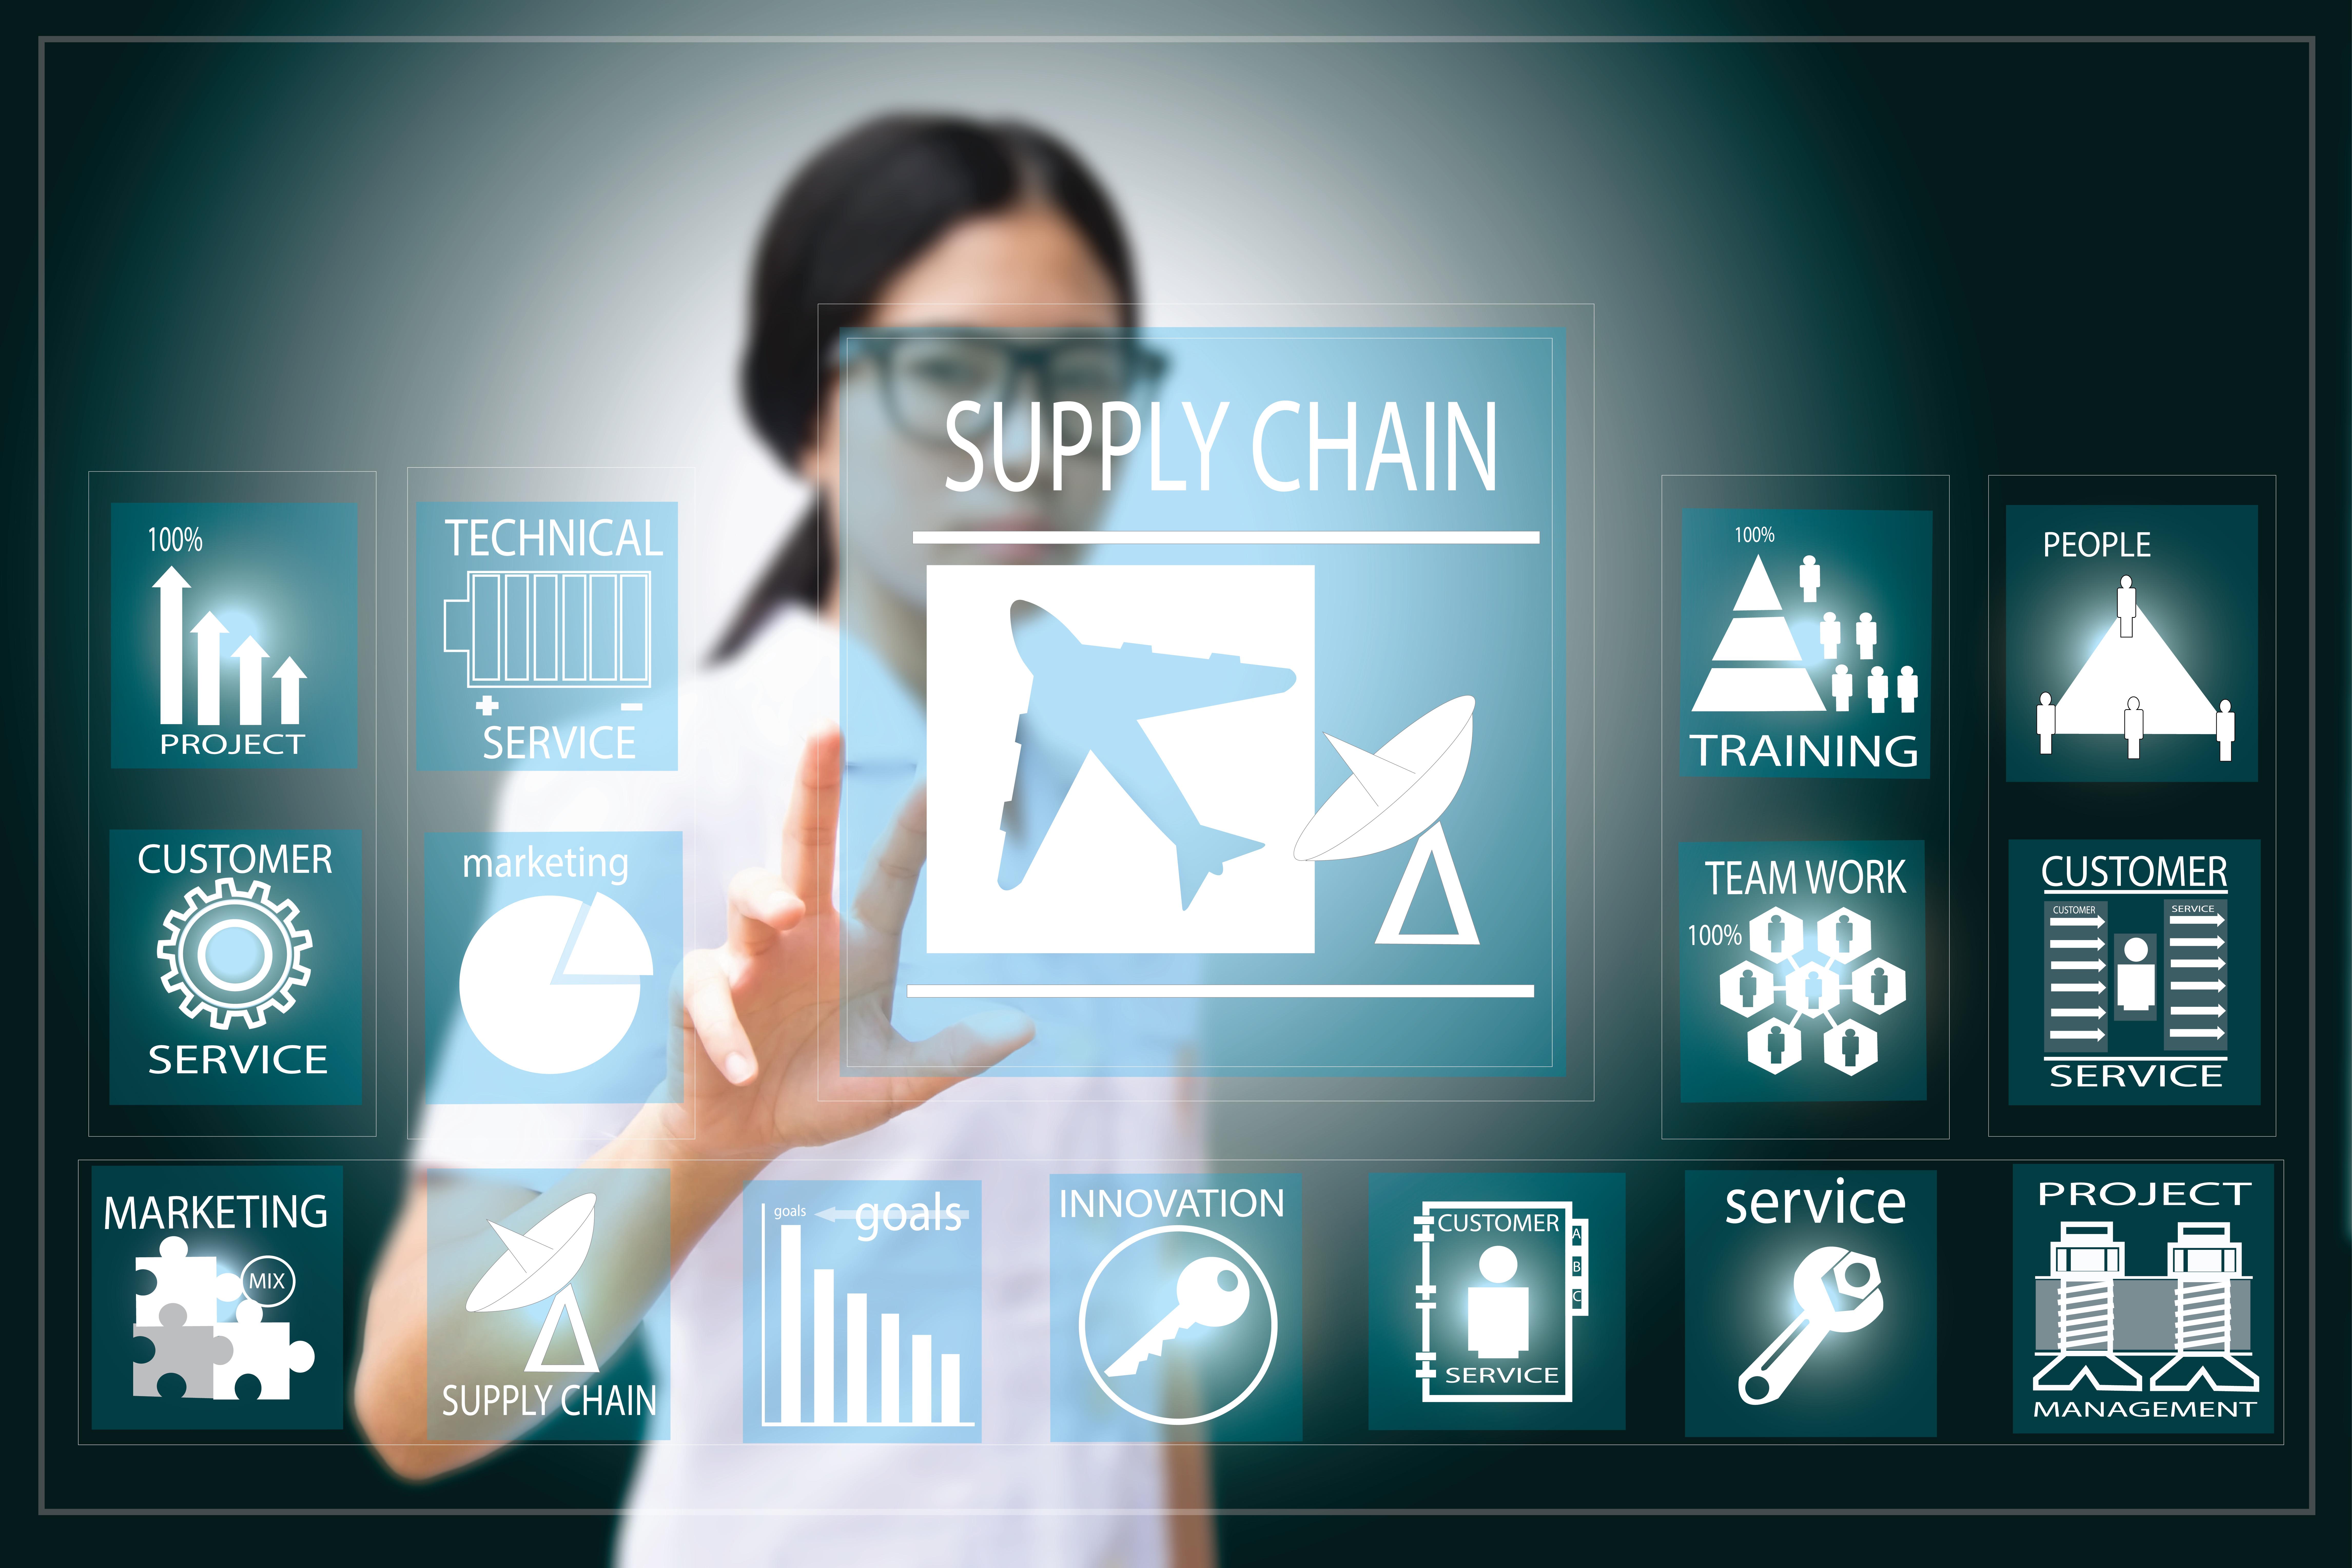 Cleveland supply chain management strategies